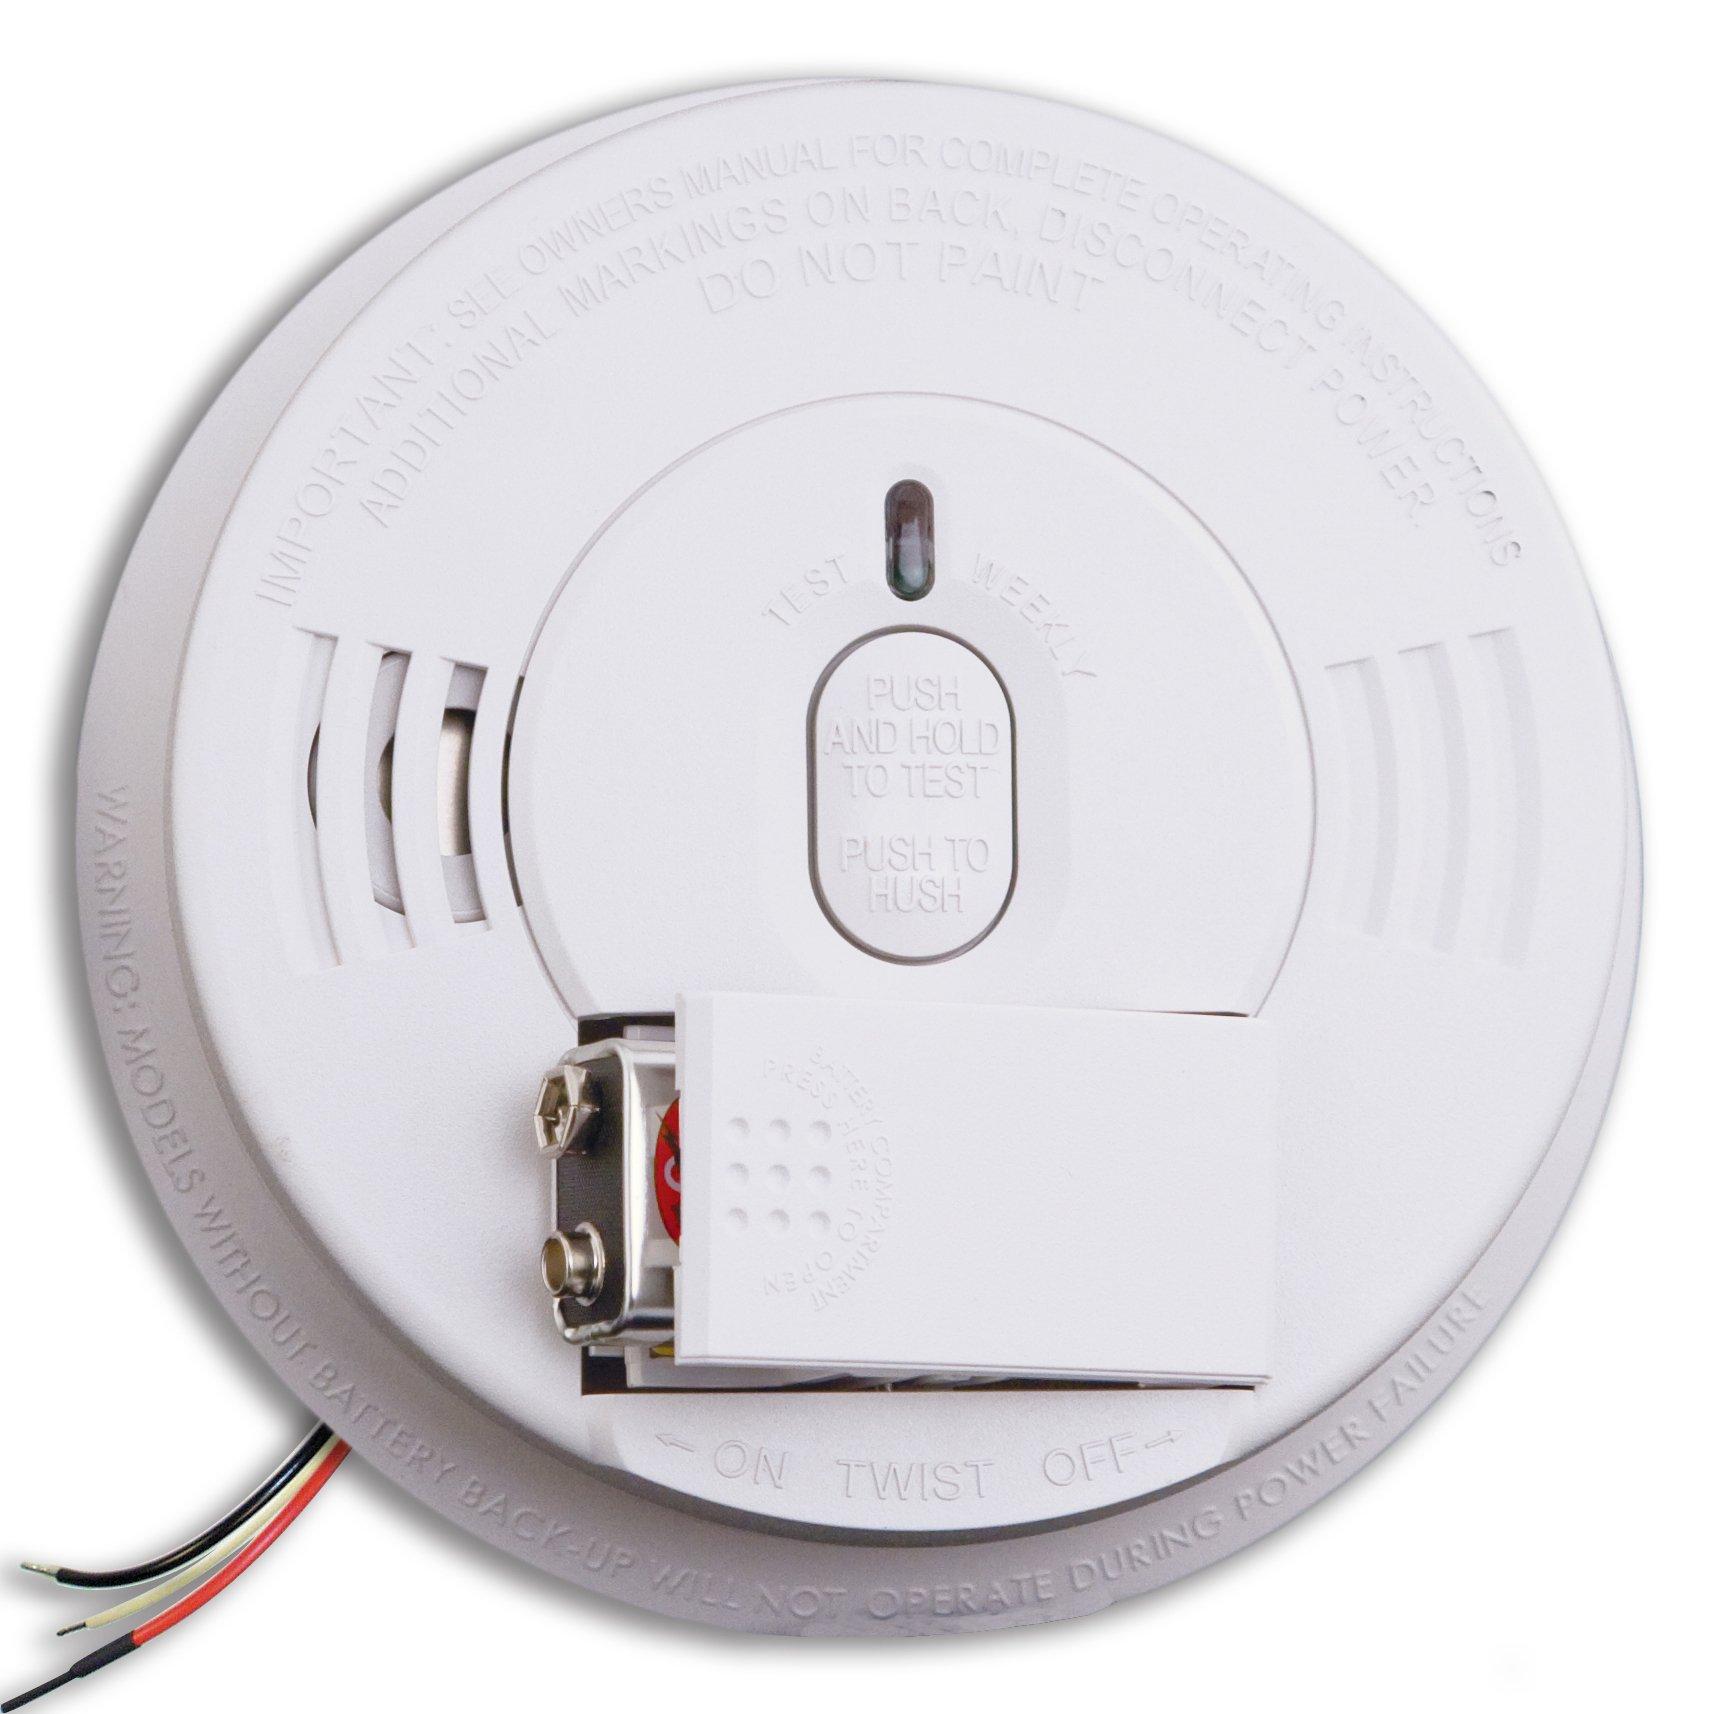 Kidde i12060 Hardwire with Front Load Battery Backup Smoke Alarm, 1 Pack, White by Kidde